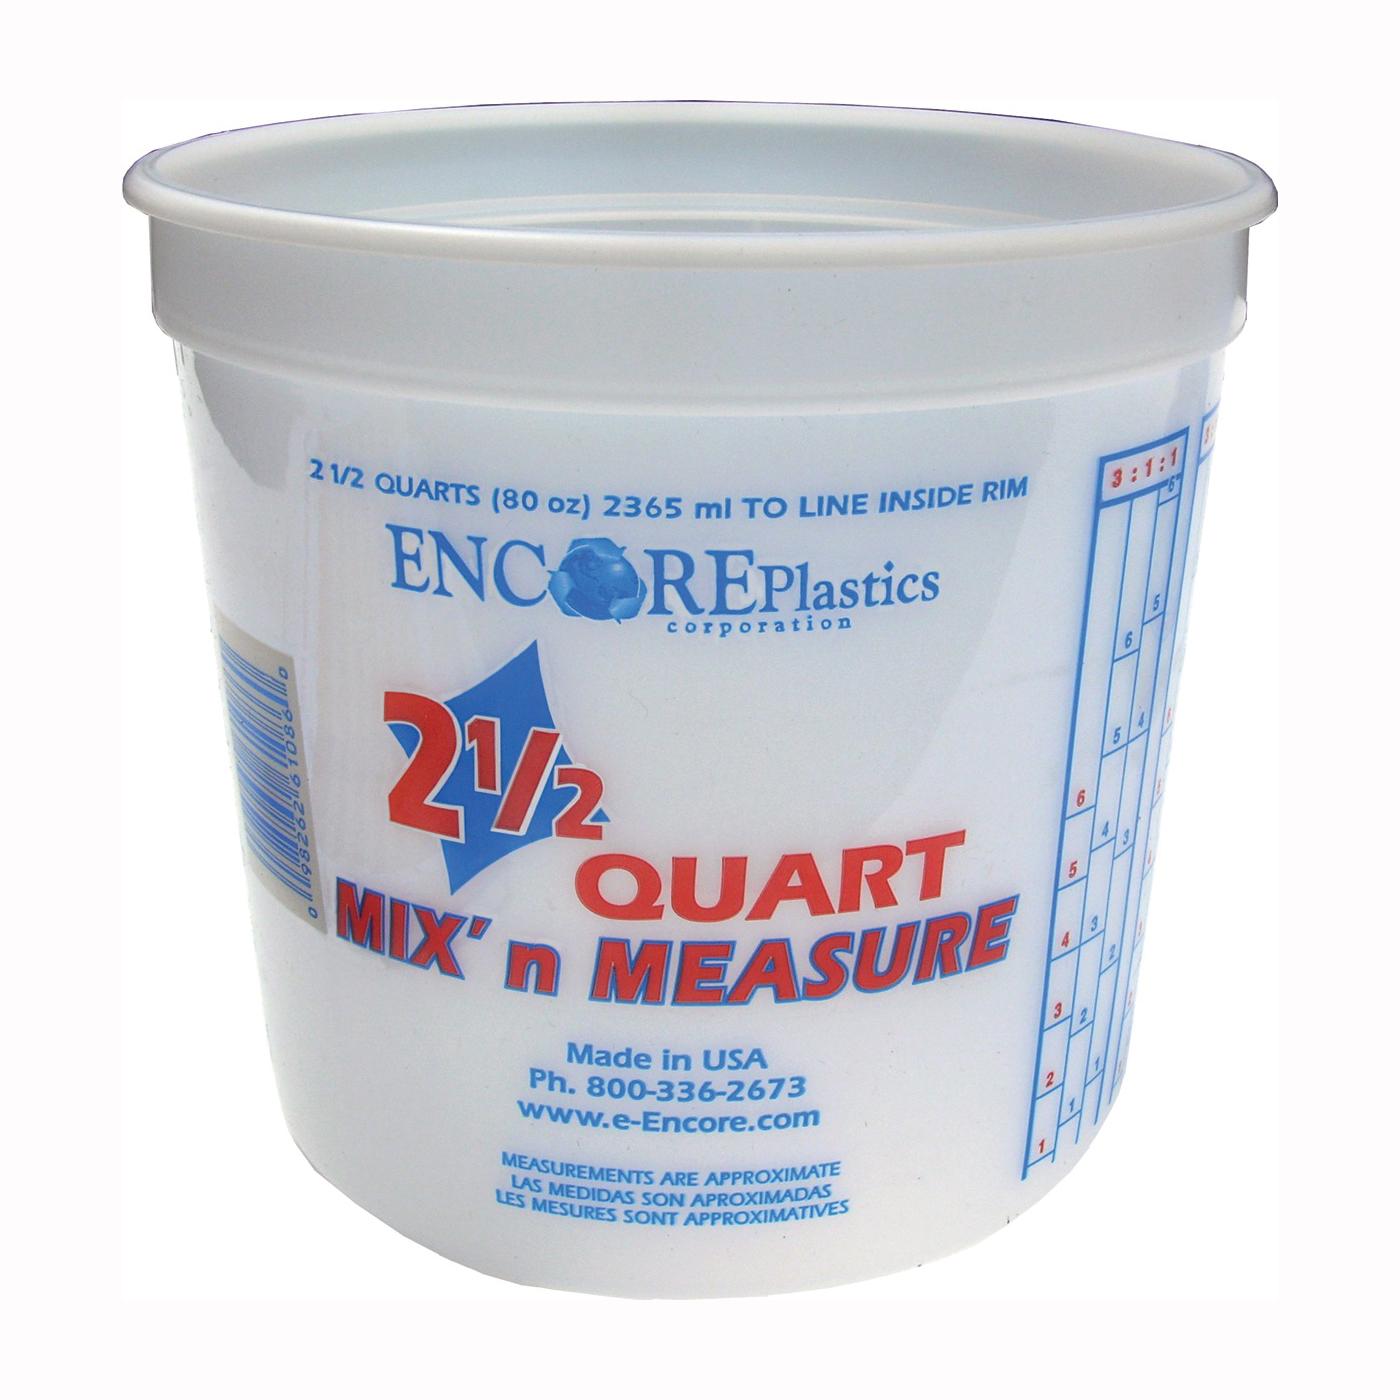 Picture of ENCORE Plastics 300344 Paint Container, 2.5 qt Capacity, Plastic